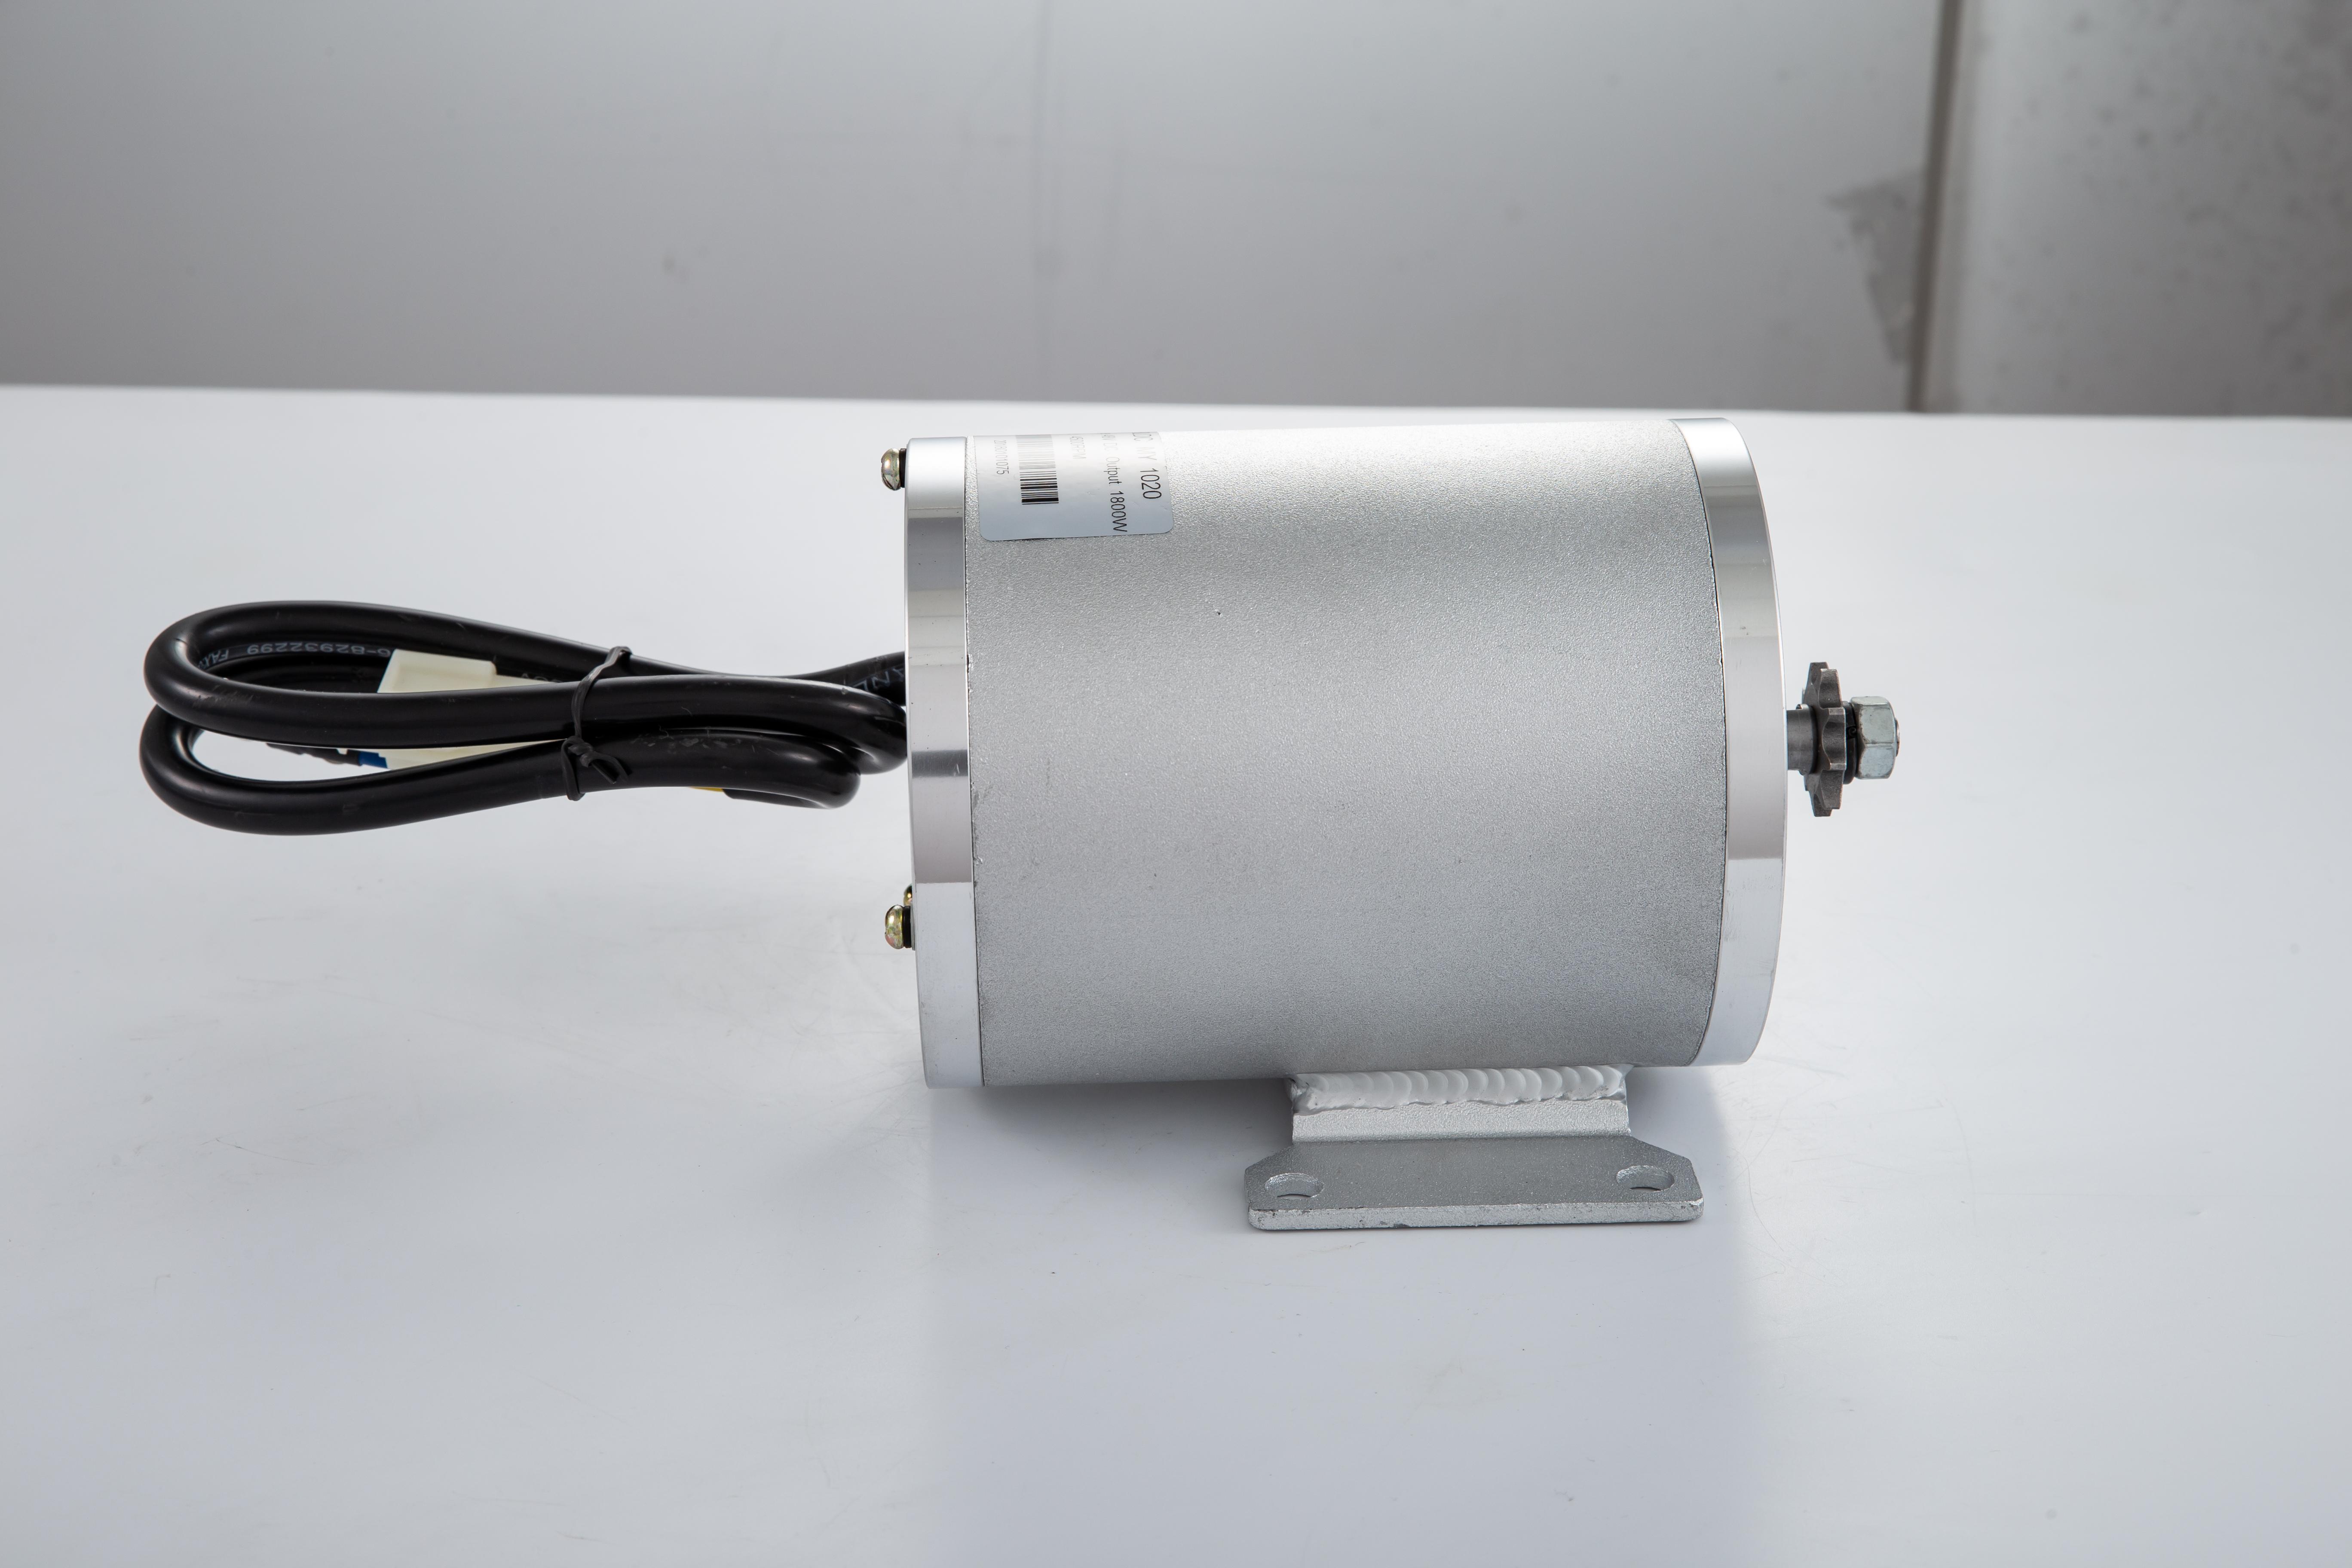 1800W-48V-DC-Brushless-Electric-Motor-Kit-f-Scooter-500-1800W-E-Bike-Go-Kart thumbnail 216